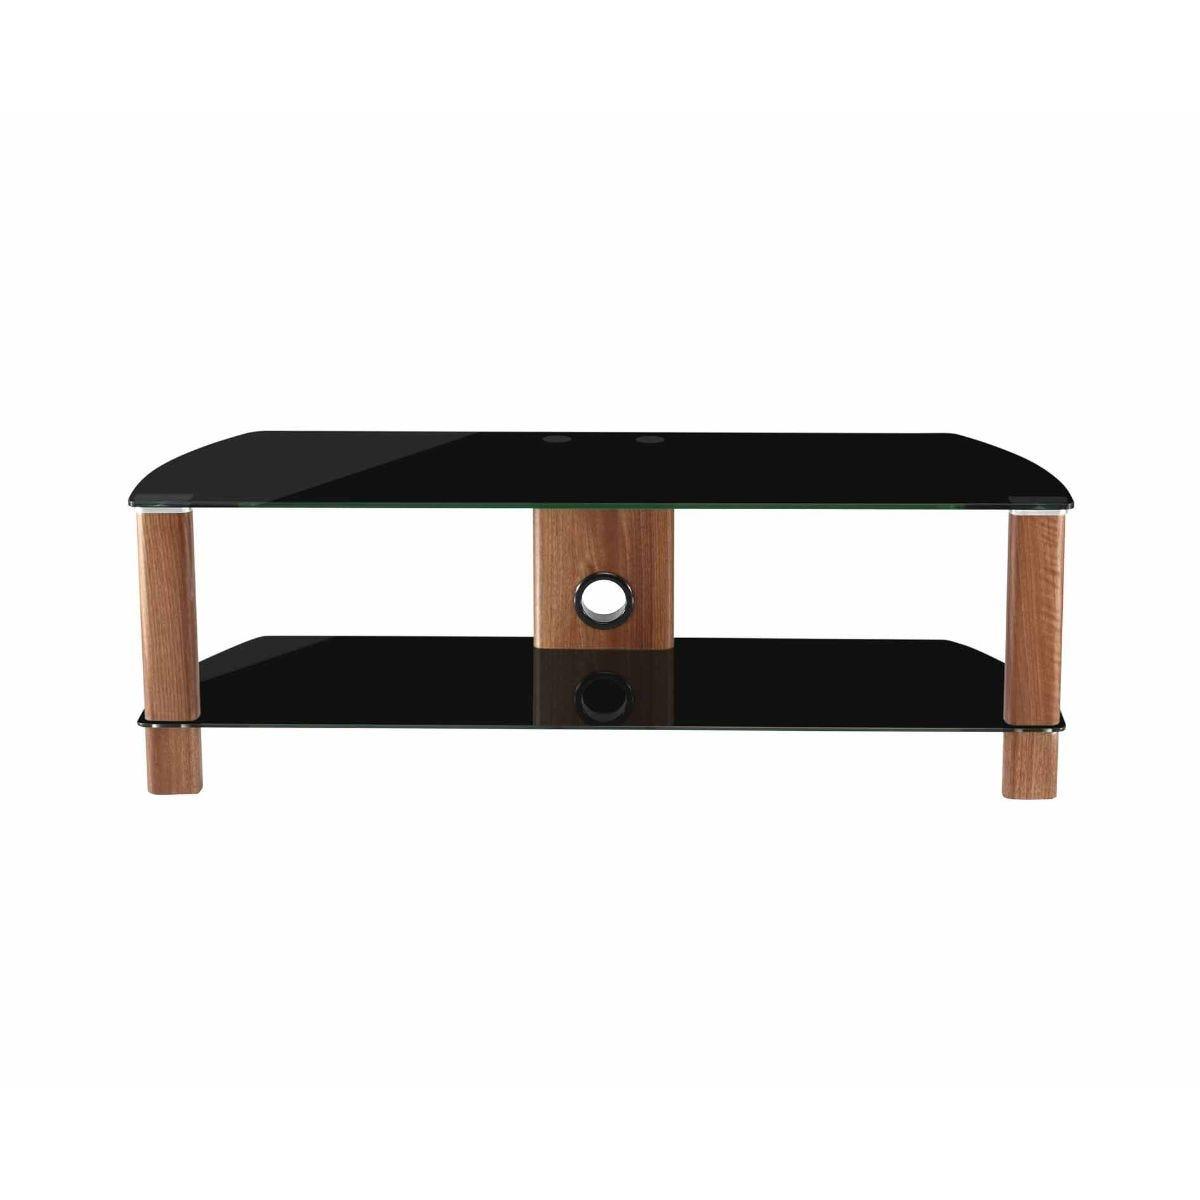 Alphason Century 1200 2 Shelf TV Stand Black Glass, Black